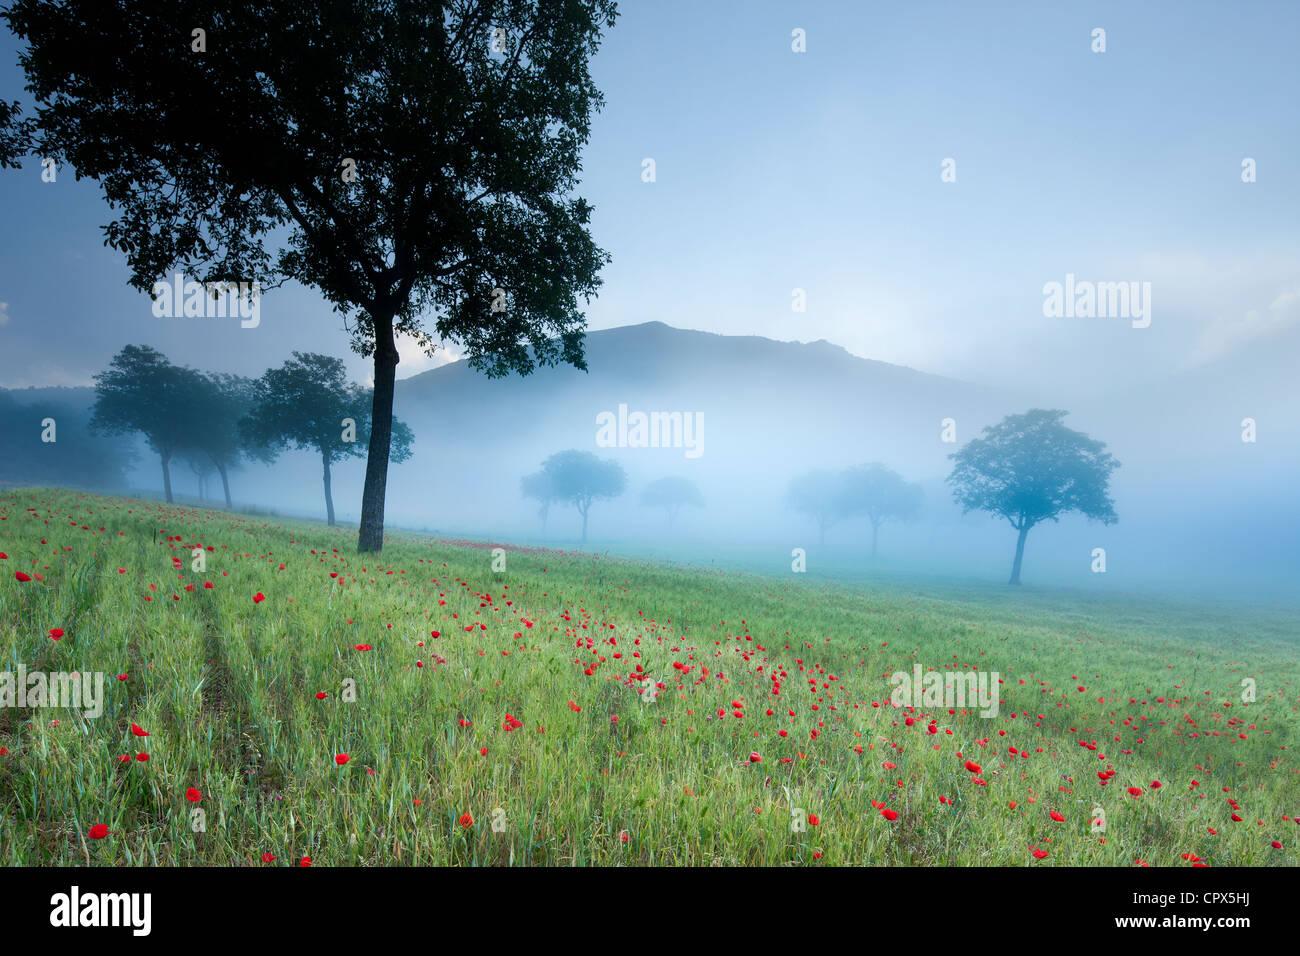 Coquelicots dans un champ, nr Norcia, Ombrie, Italie Photo Stock